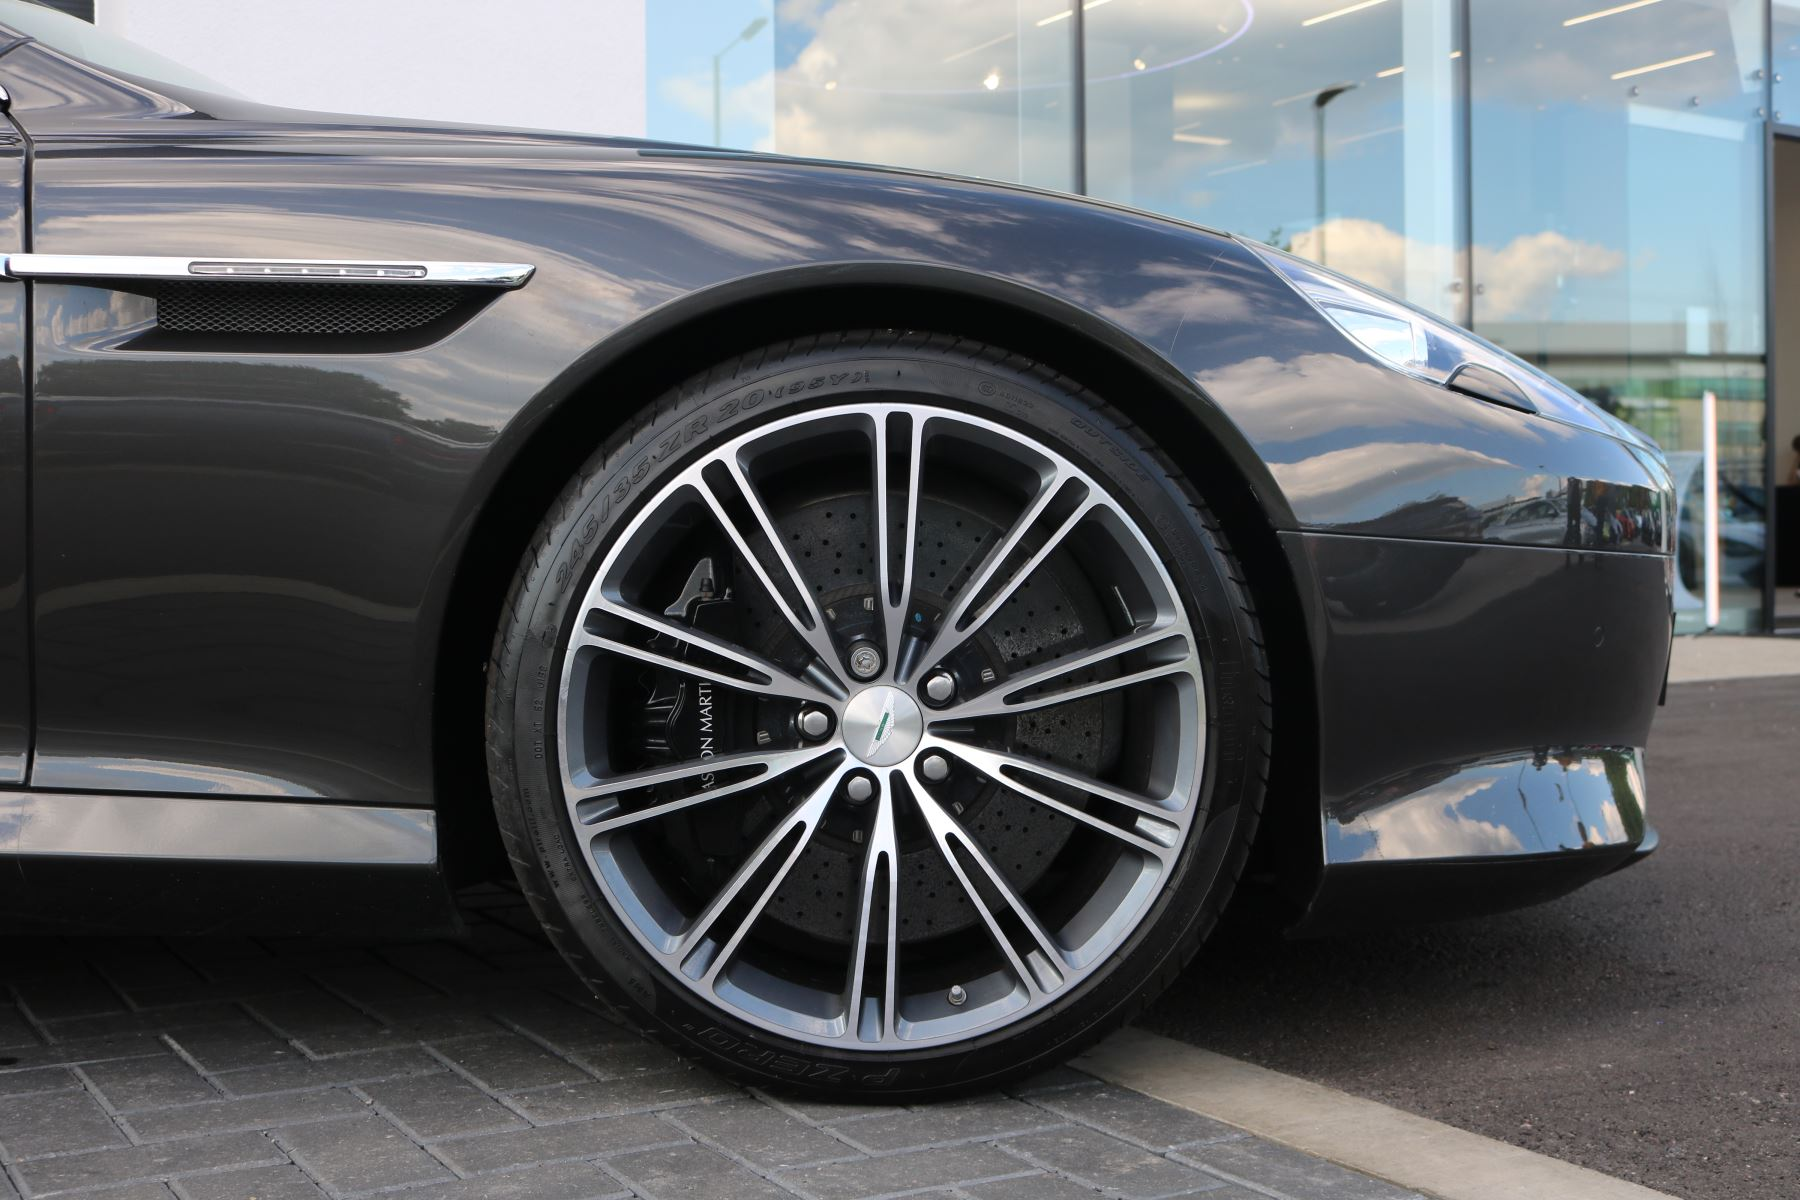 Aston Martin Virage V12 2dr Volante Touchtronic image 9